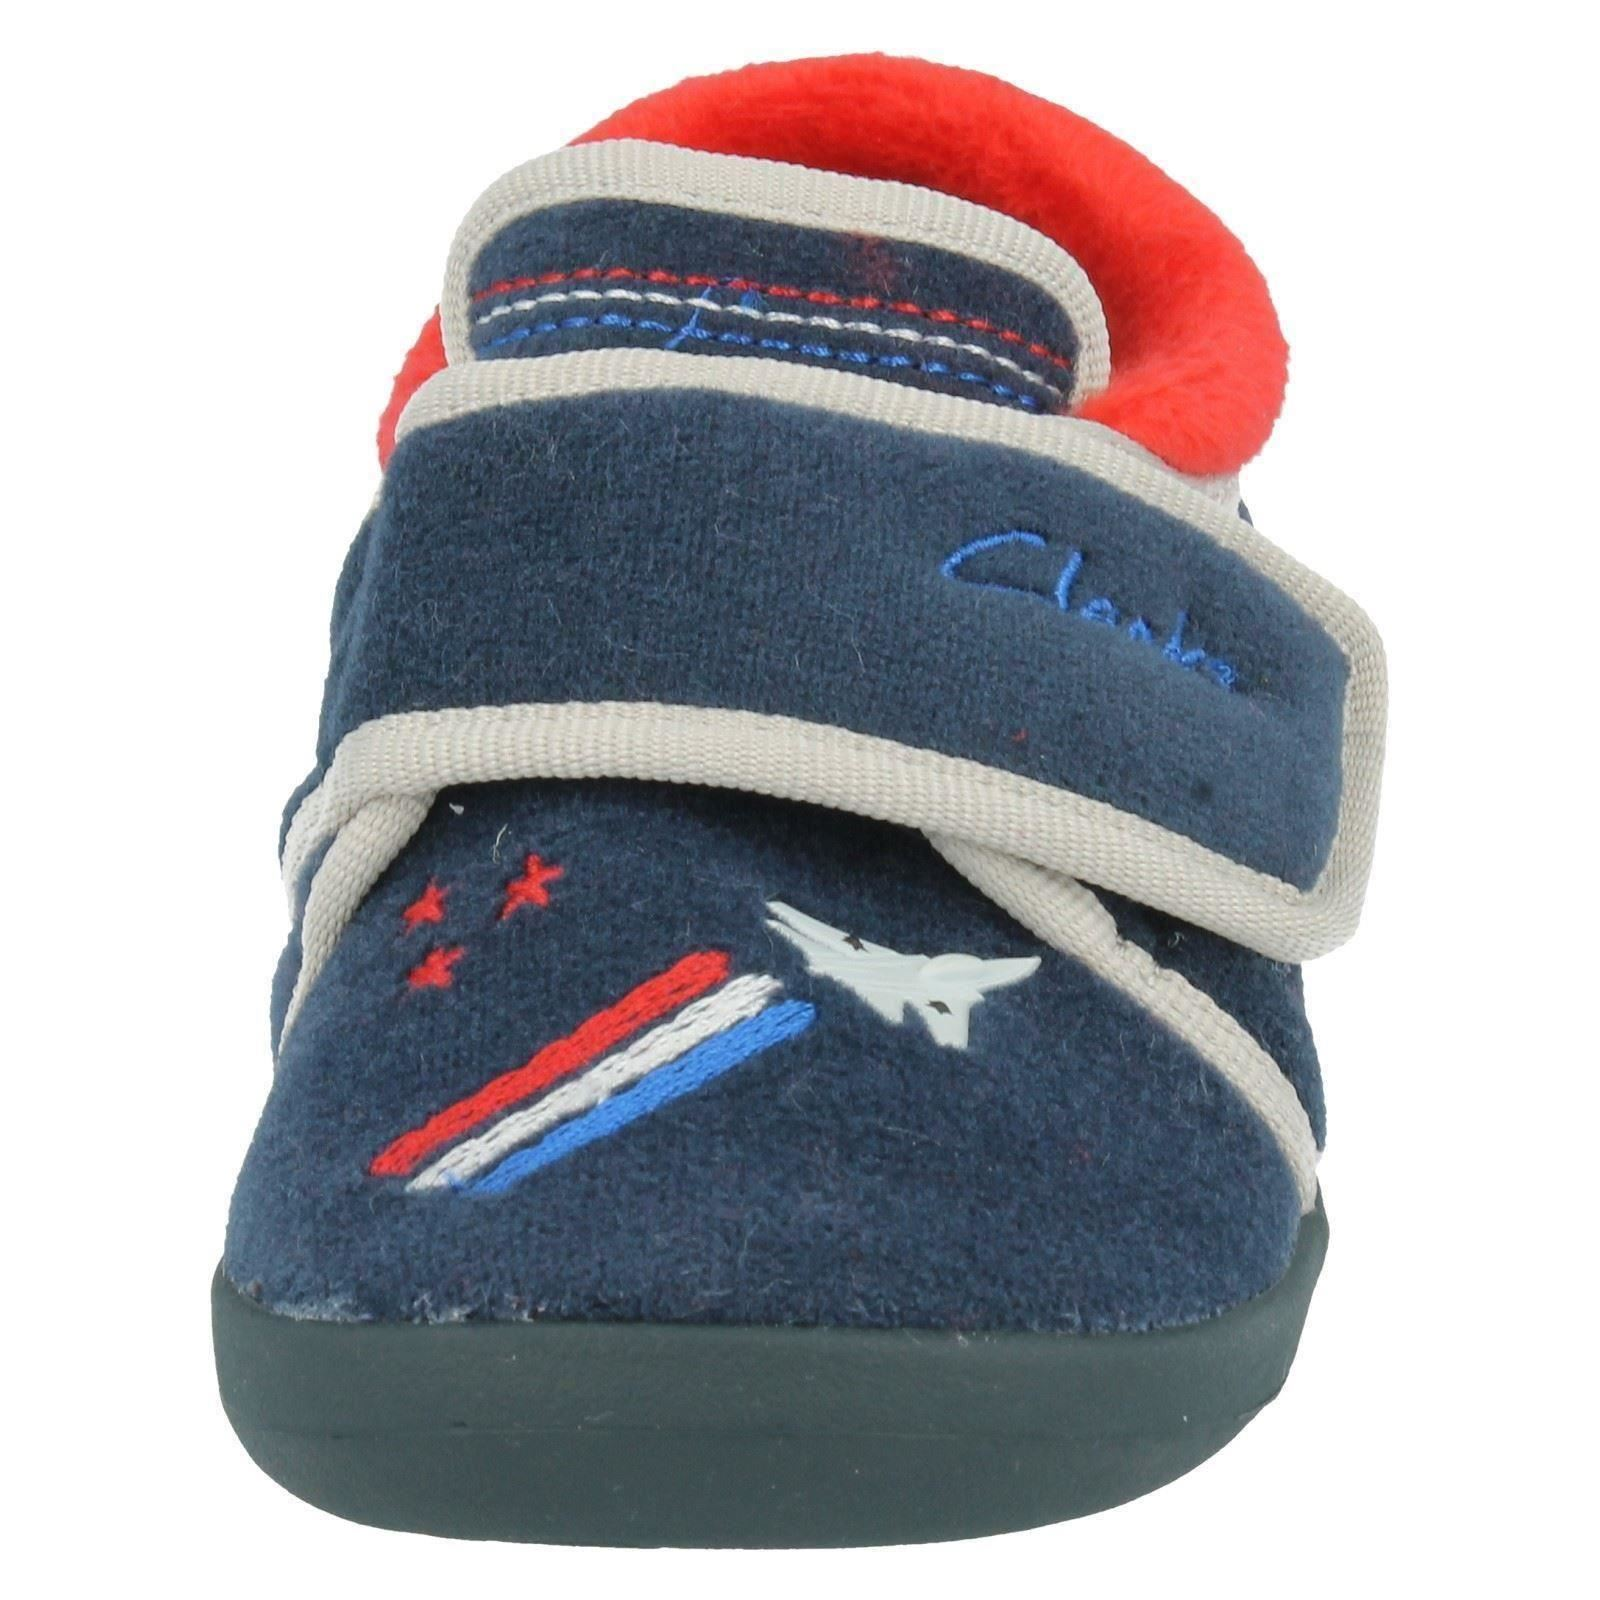 Boys Clarks 'Jet Sleep' Slippers The Style ~ K